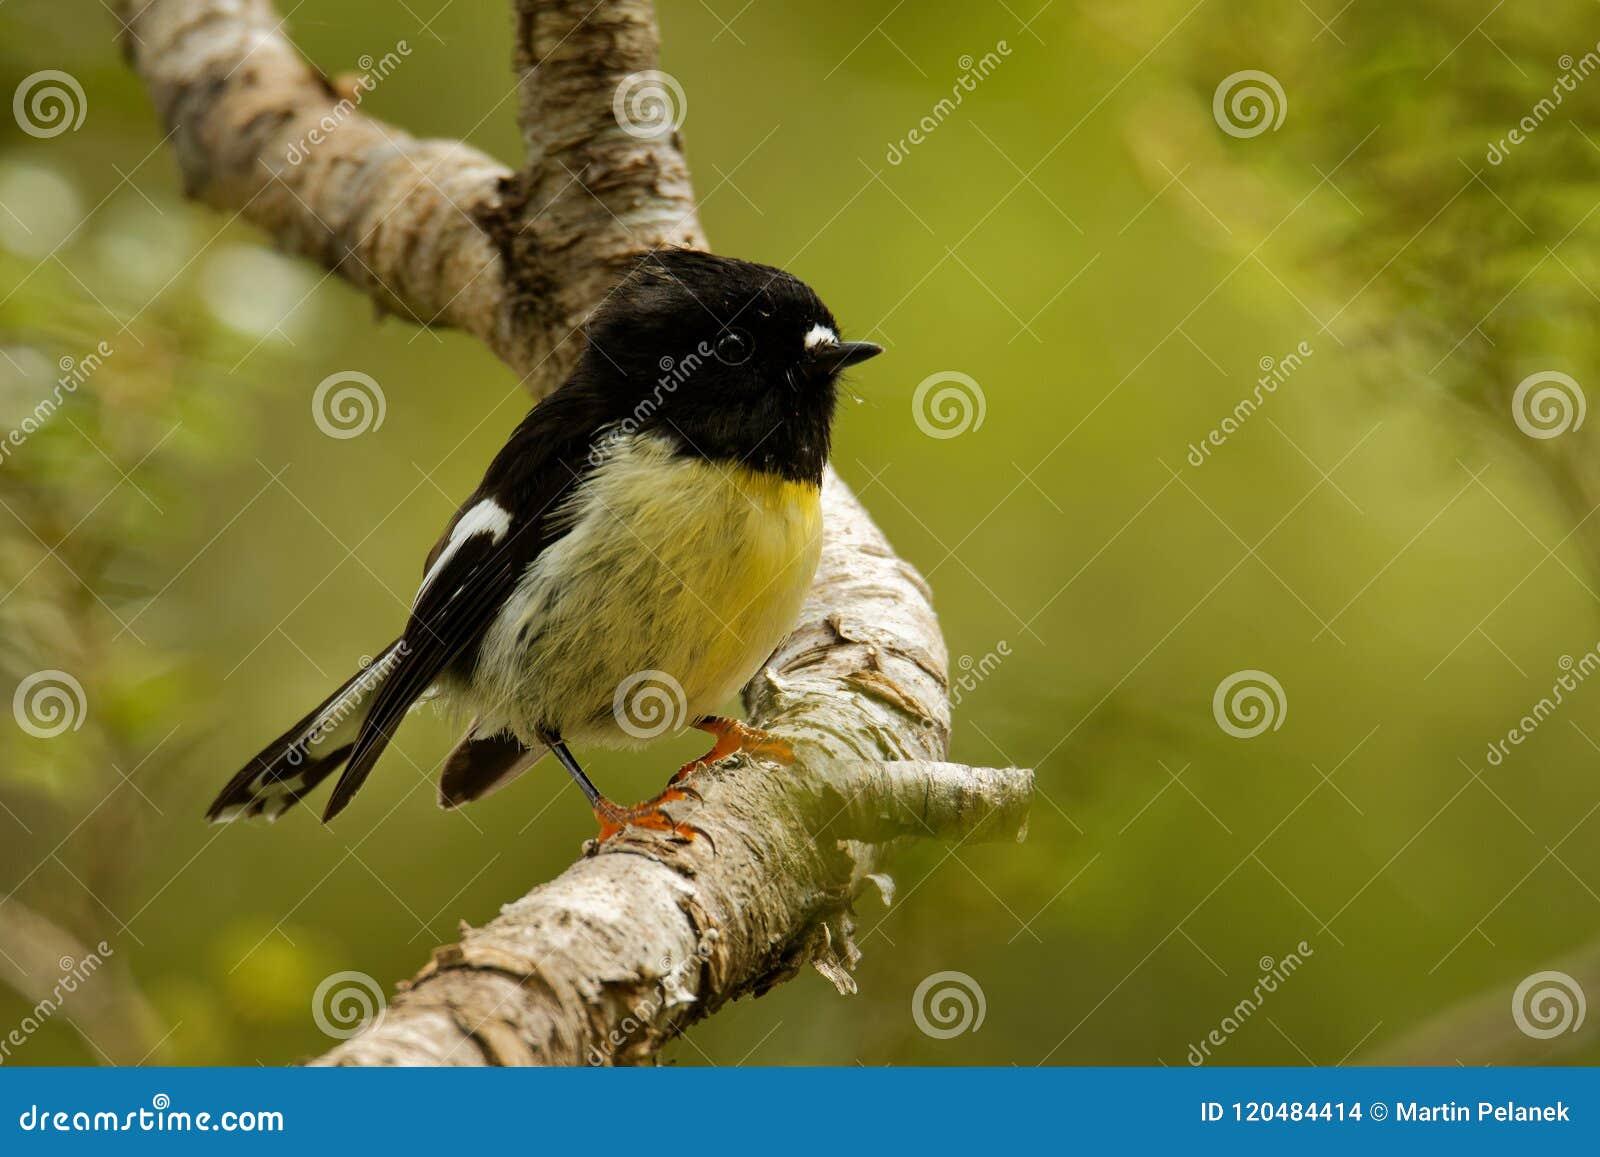 Macrocephala macrocephala Petroica - νότιο νησί Tomtit - miromiro ενδημική συνεδρίαση πουλιών της Νέας Ζηλανδίας δασική στον κλάδ